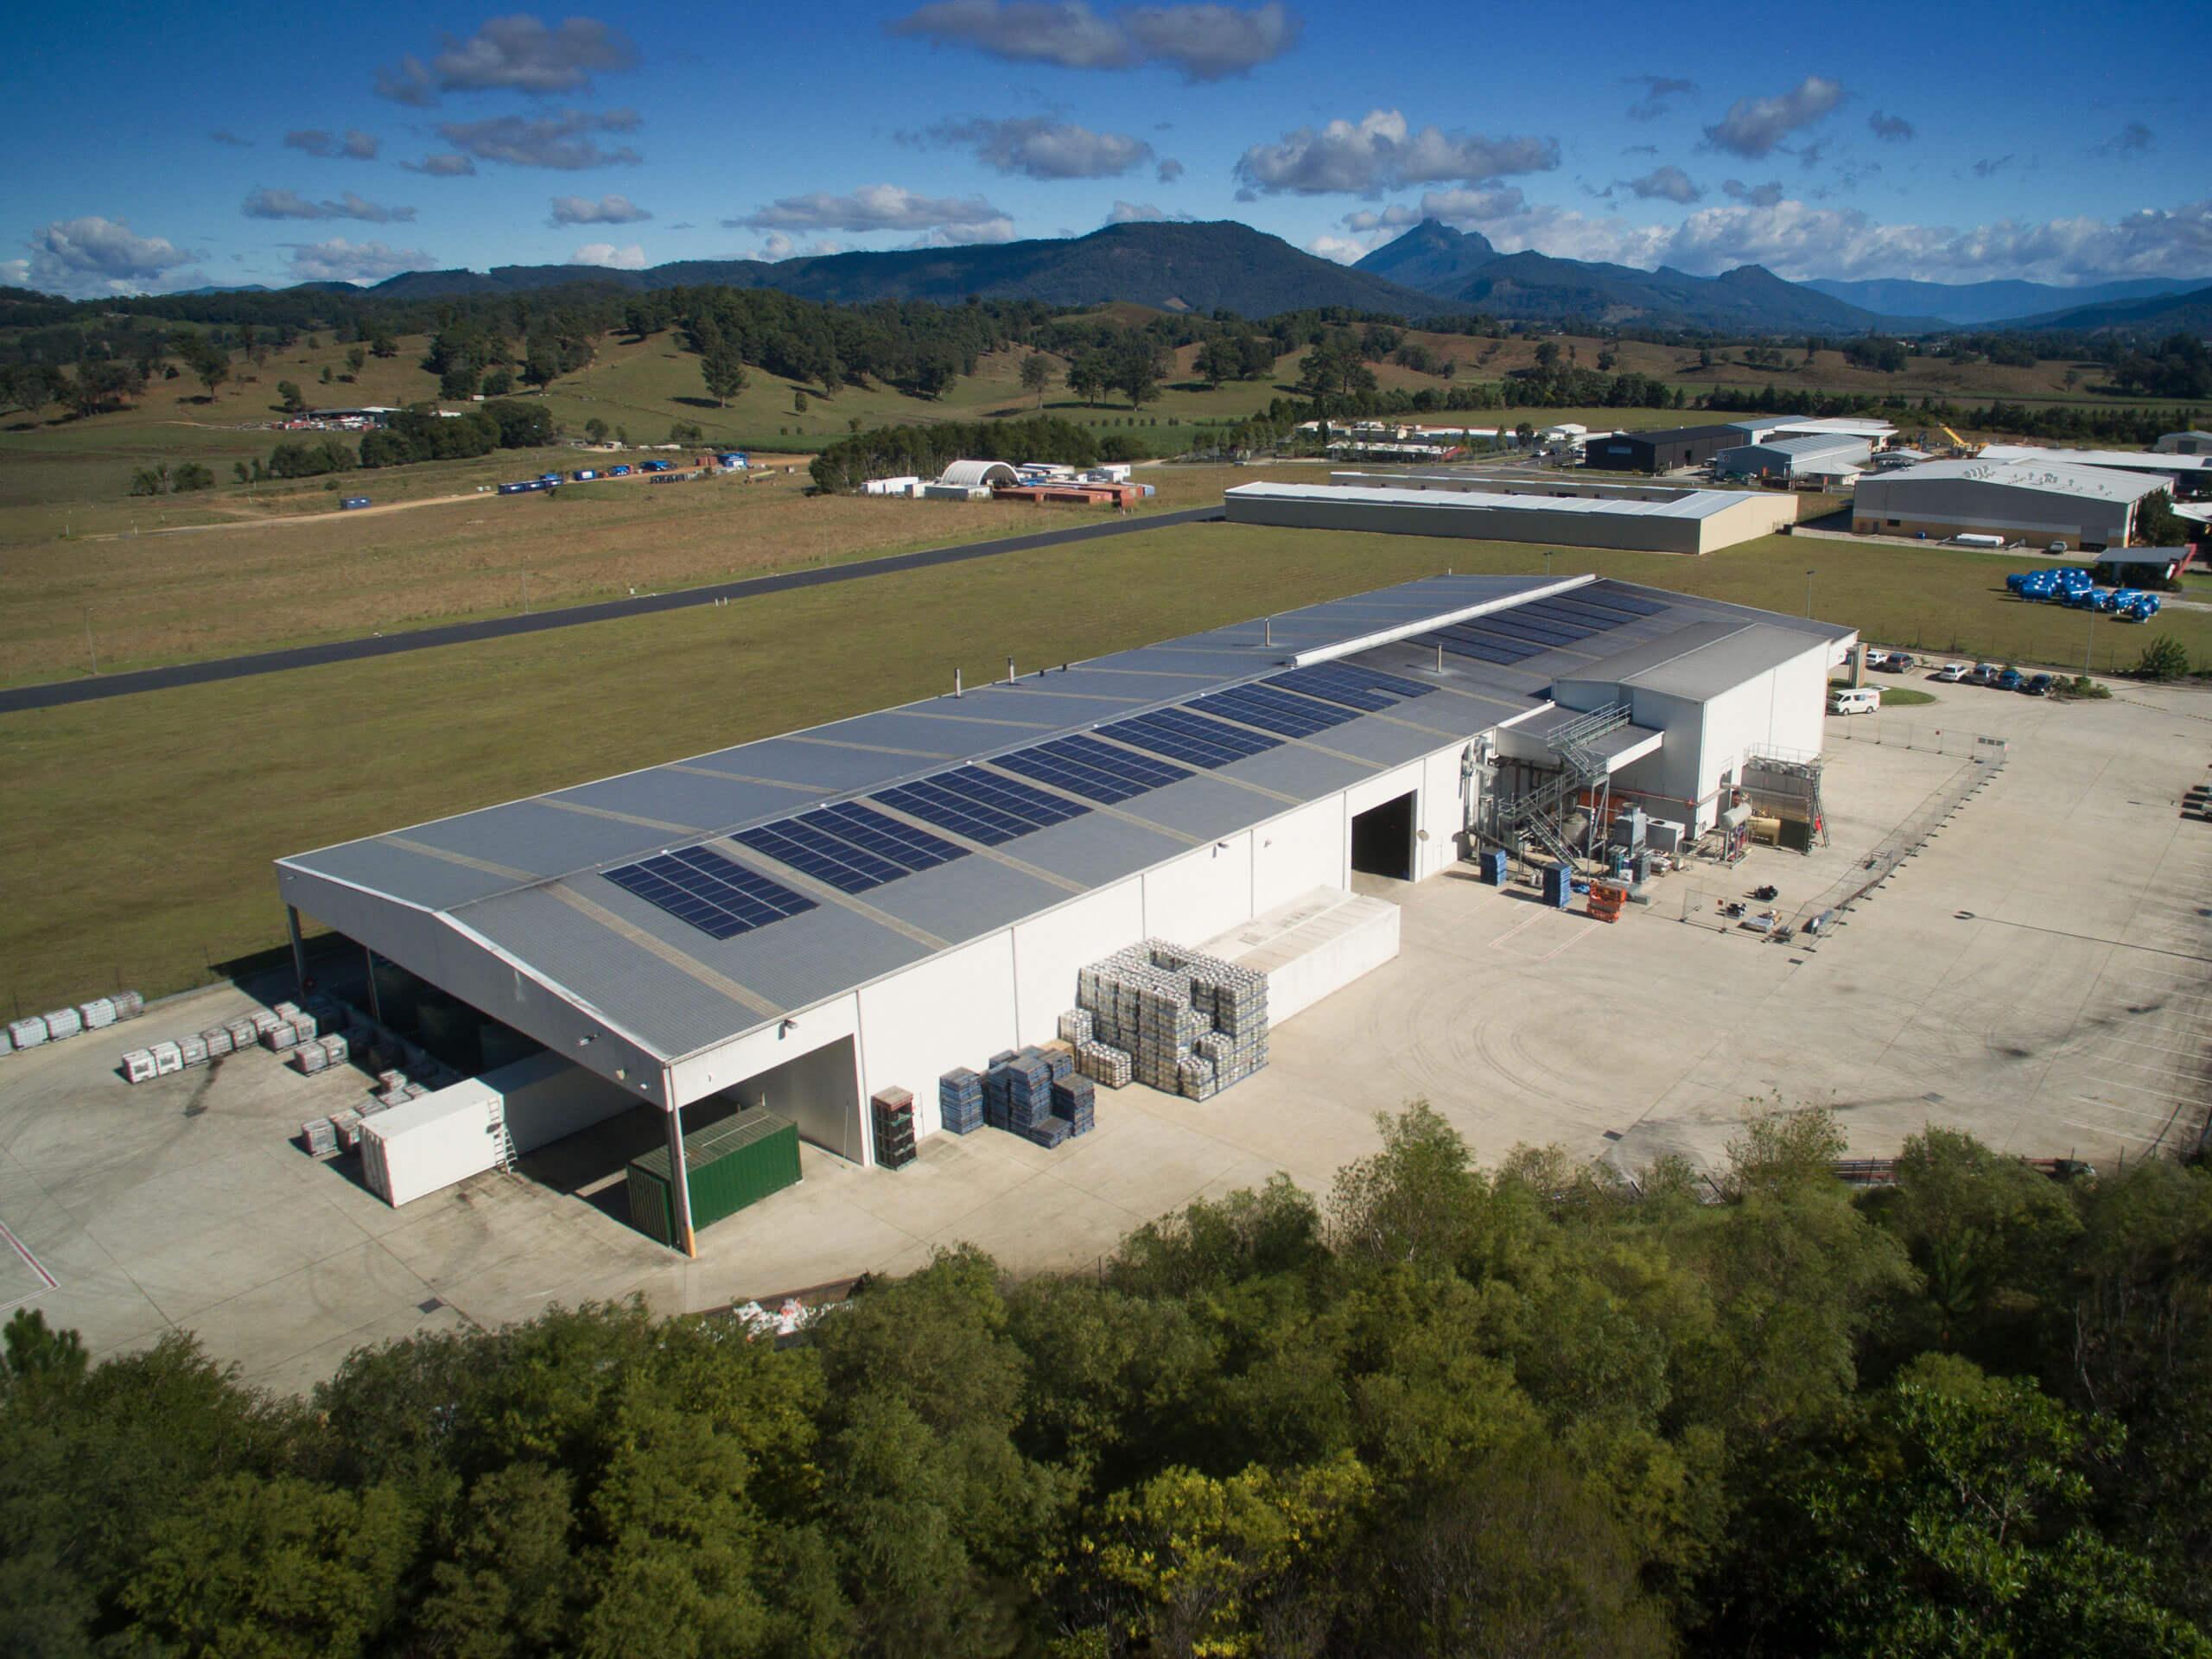 Stone Amp Wood Brewery Enertech Solar